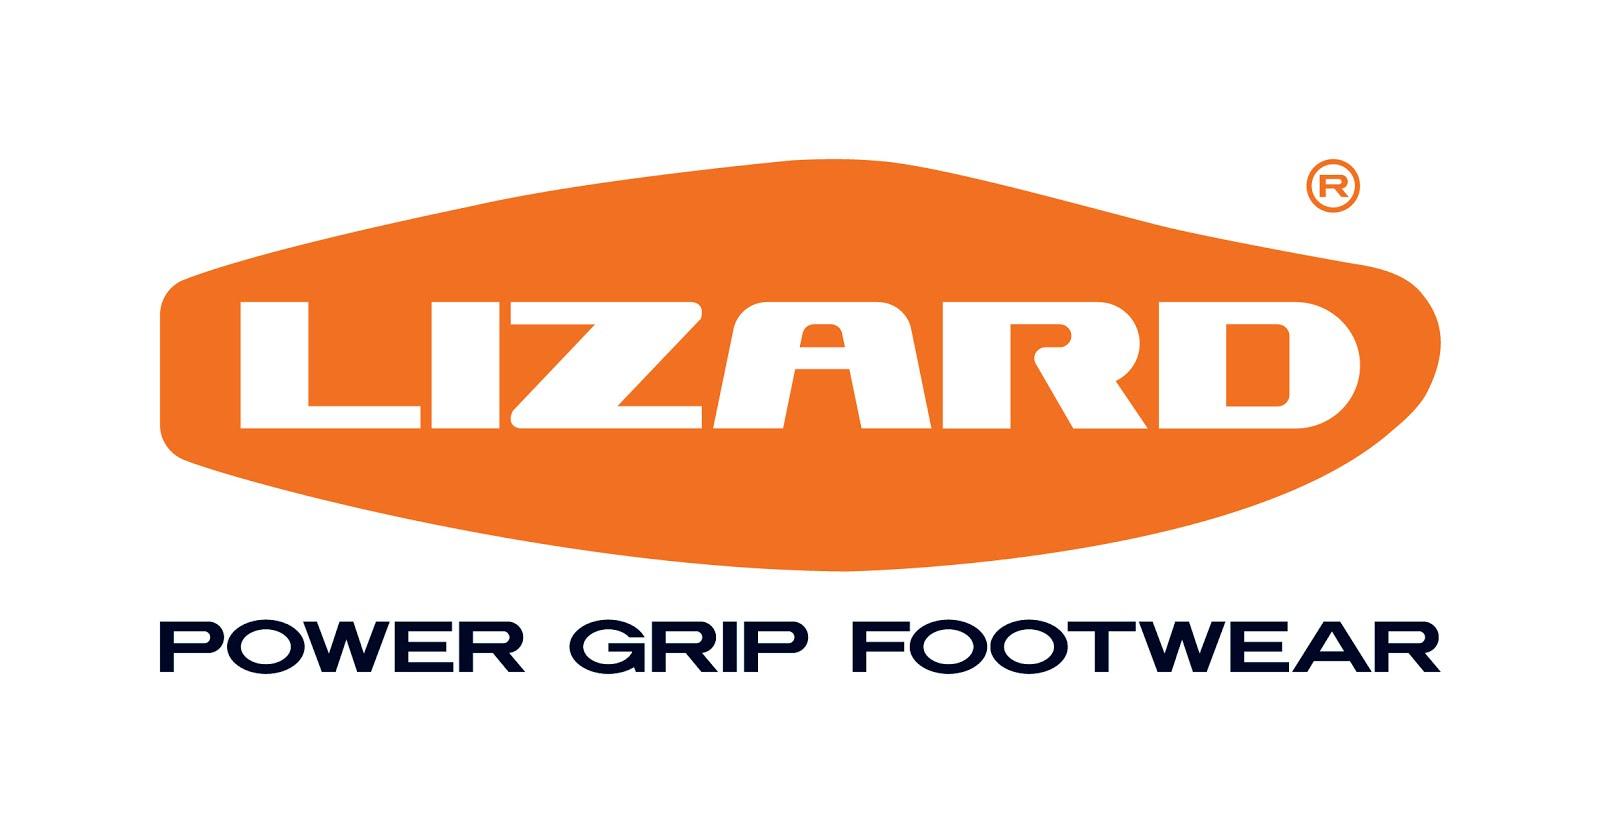 Noi esploriamo il mondo con Lizard Footwear